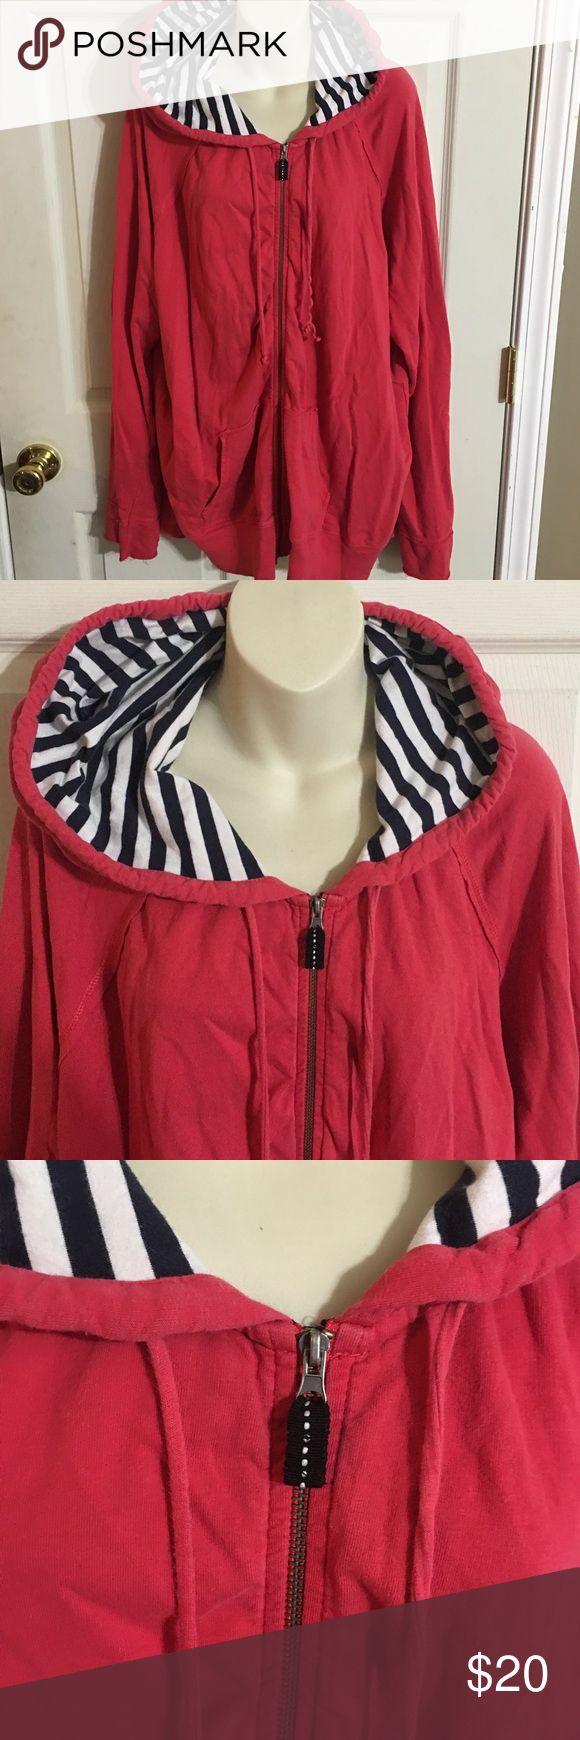 Merona Nautical Zip Up Jacket Women's Merona plus size Nautical zip up jacket size 24/26W in gently used condition.  There is minor wash wear noted.  No stains, tears or rips. Merona Jackets & Coats Utility Jackets